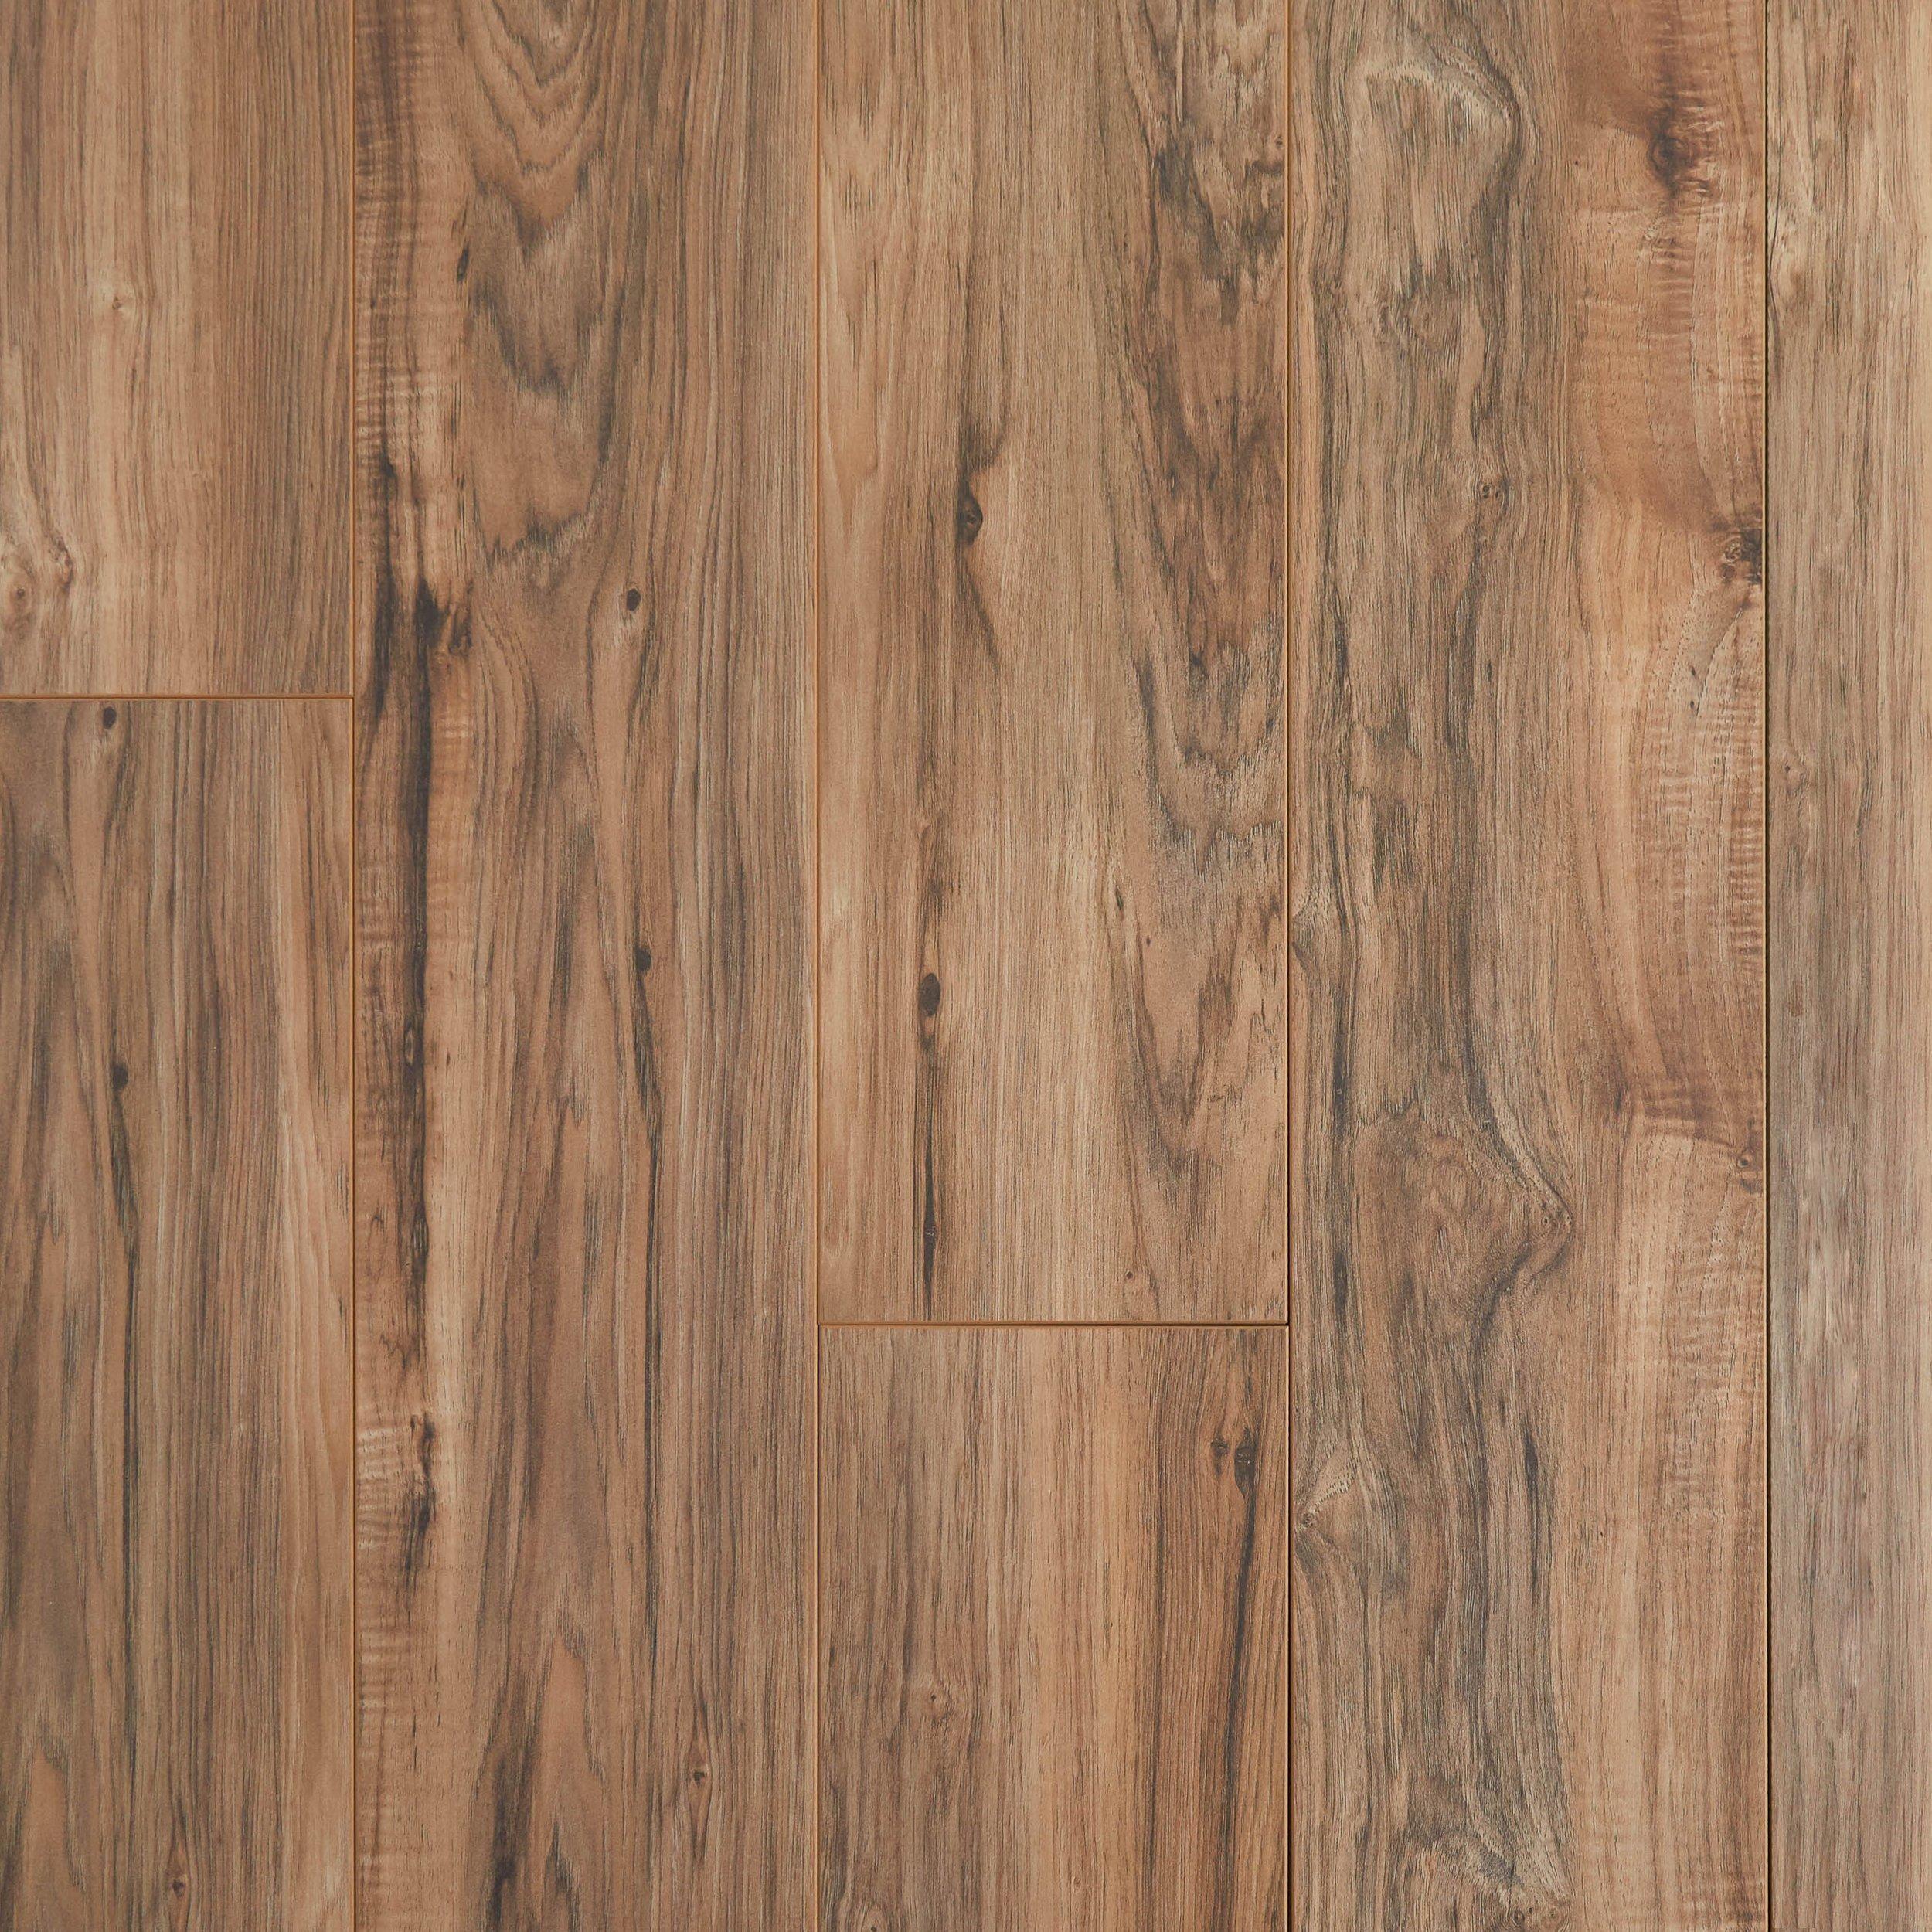 Alder Pecan Tan Water Resistant Laminate Products In 2019 Flooring Types Of Hardwood Floors